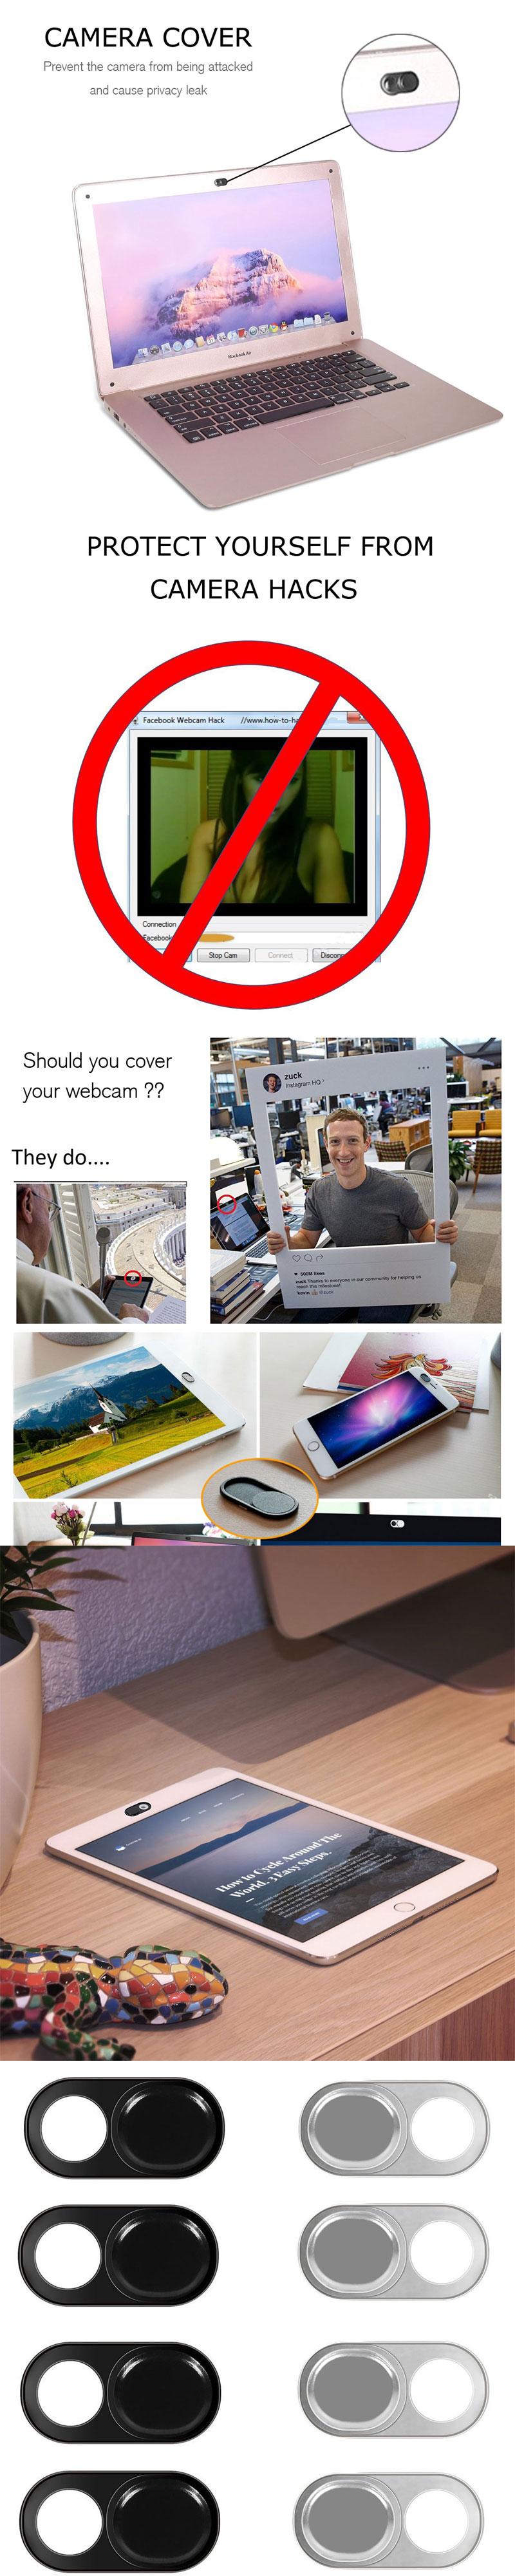 1//2//5//10Pcs Webcam Cover Slider Camera Shield fr Laptop Pad Tablet Phone Privacy